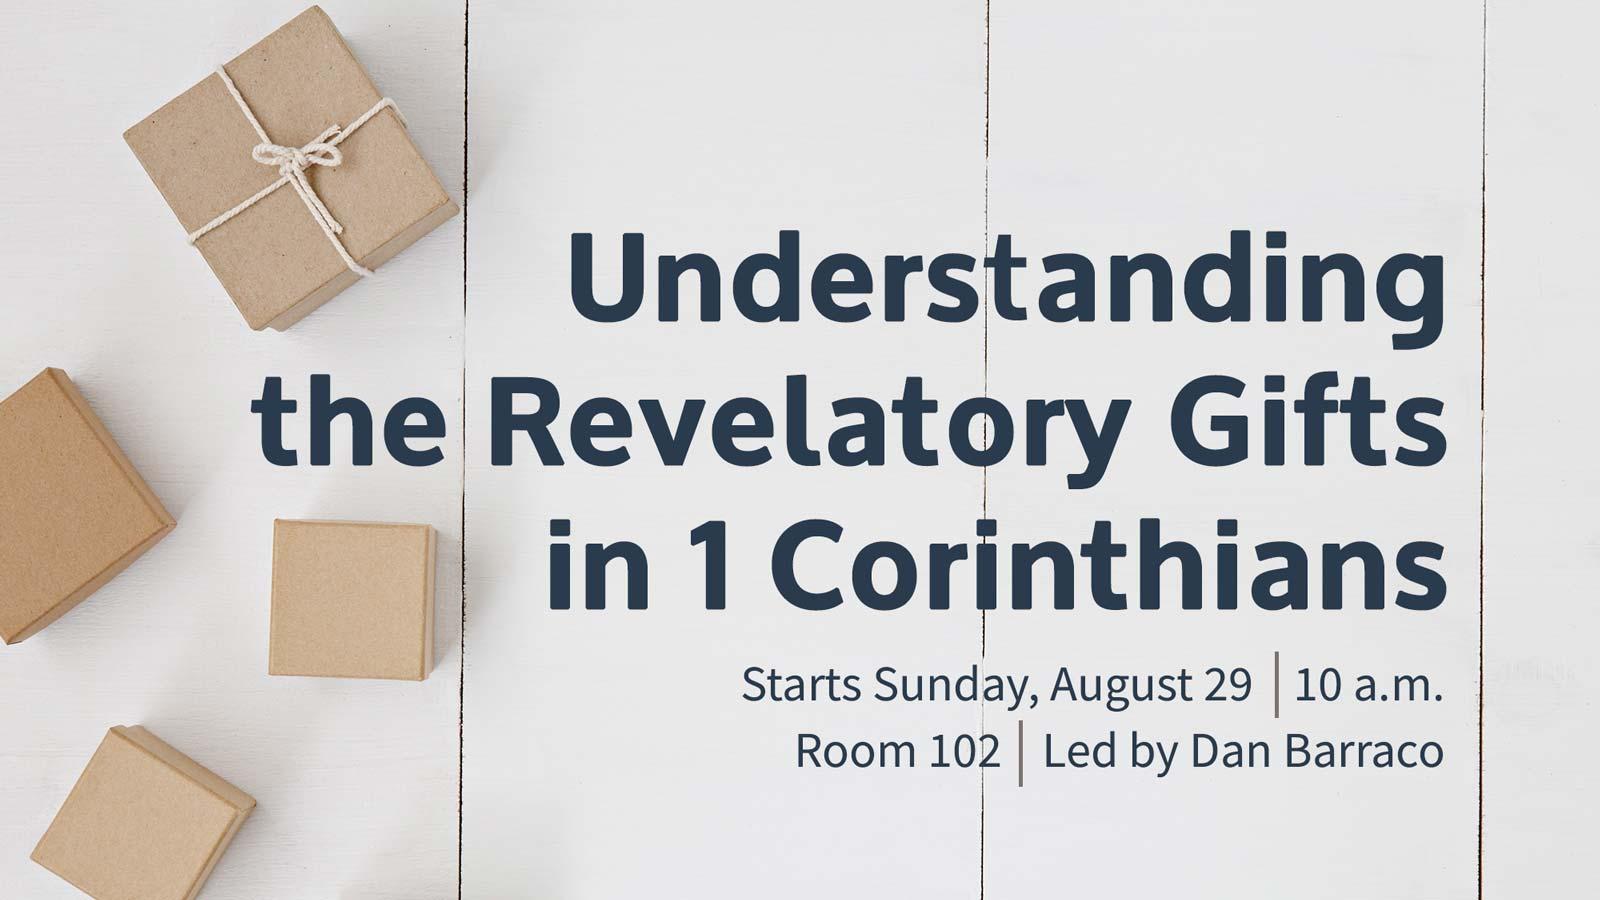 Understanding the Revelatory Gifts in 1 Corinthians Class